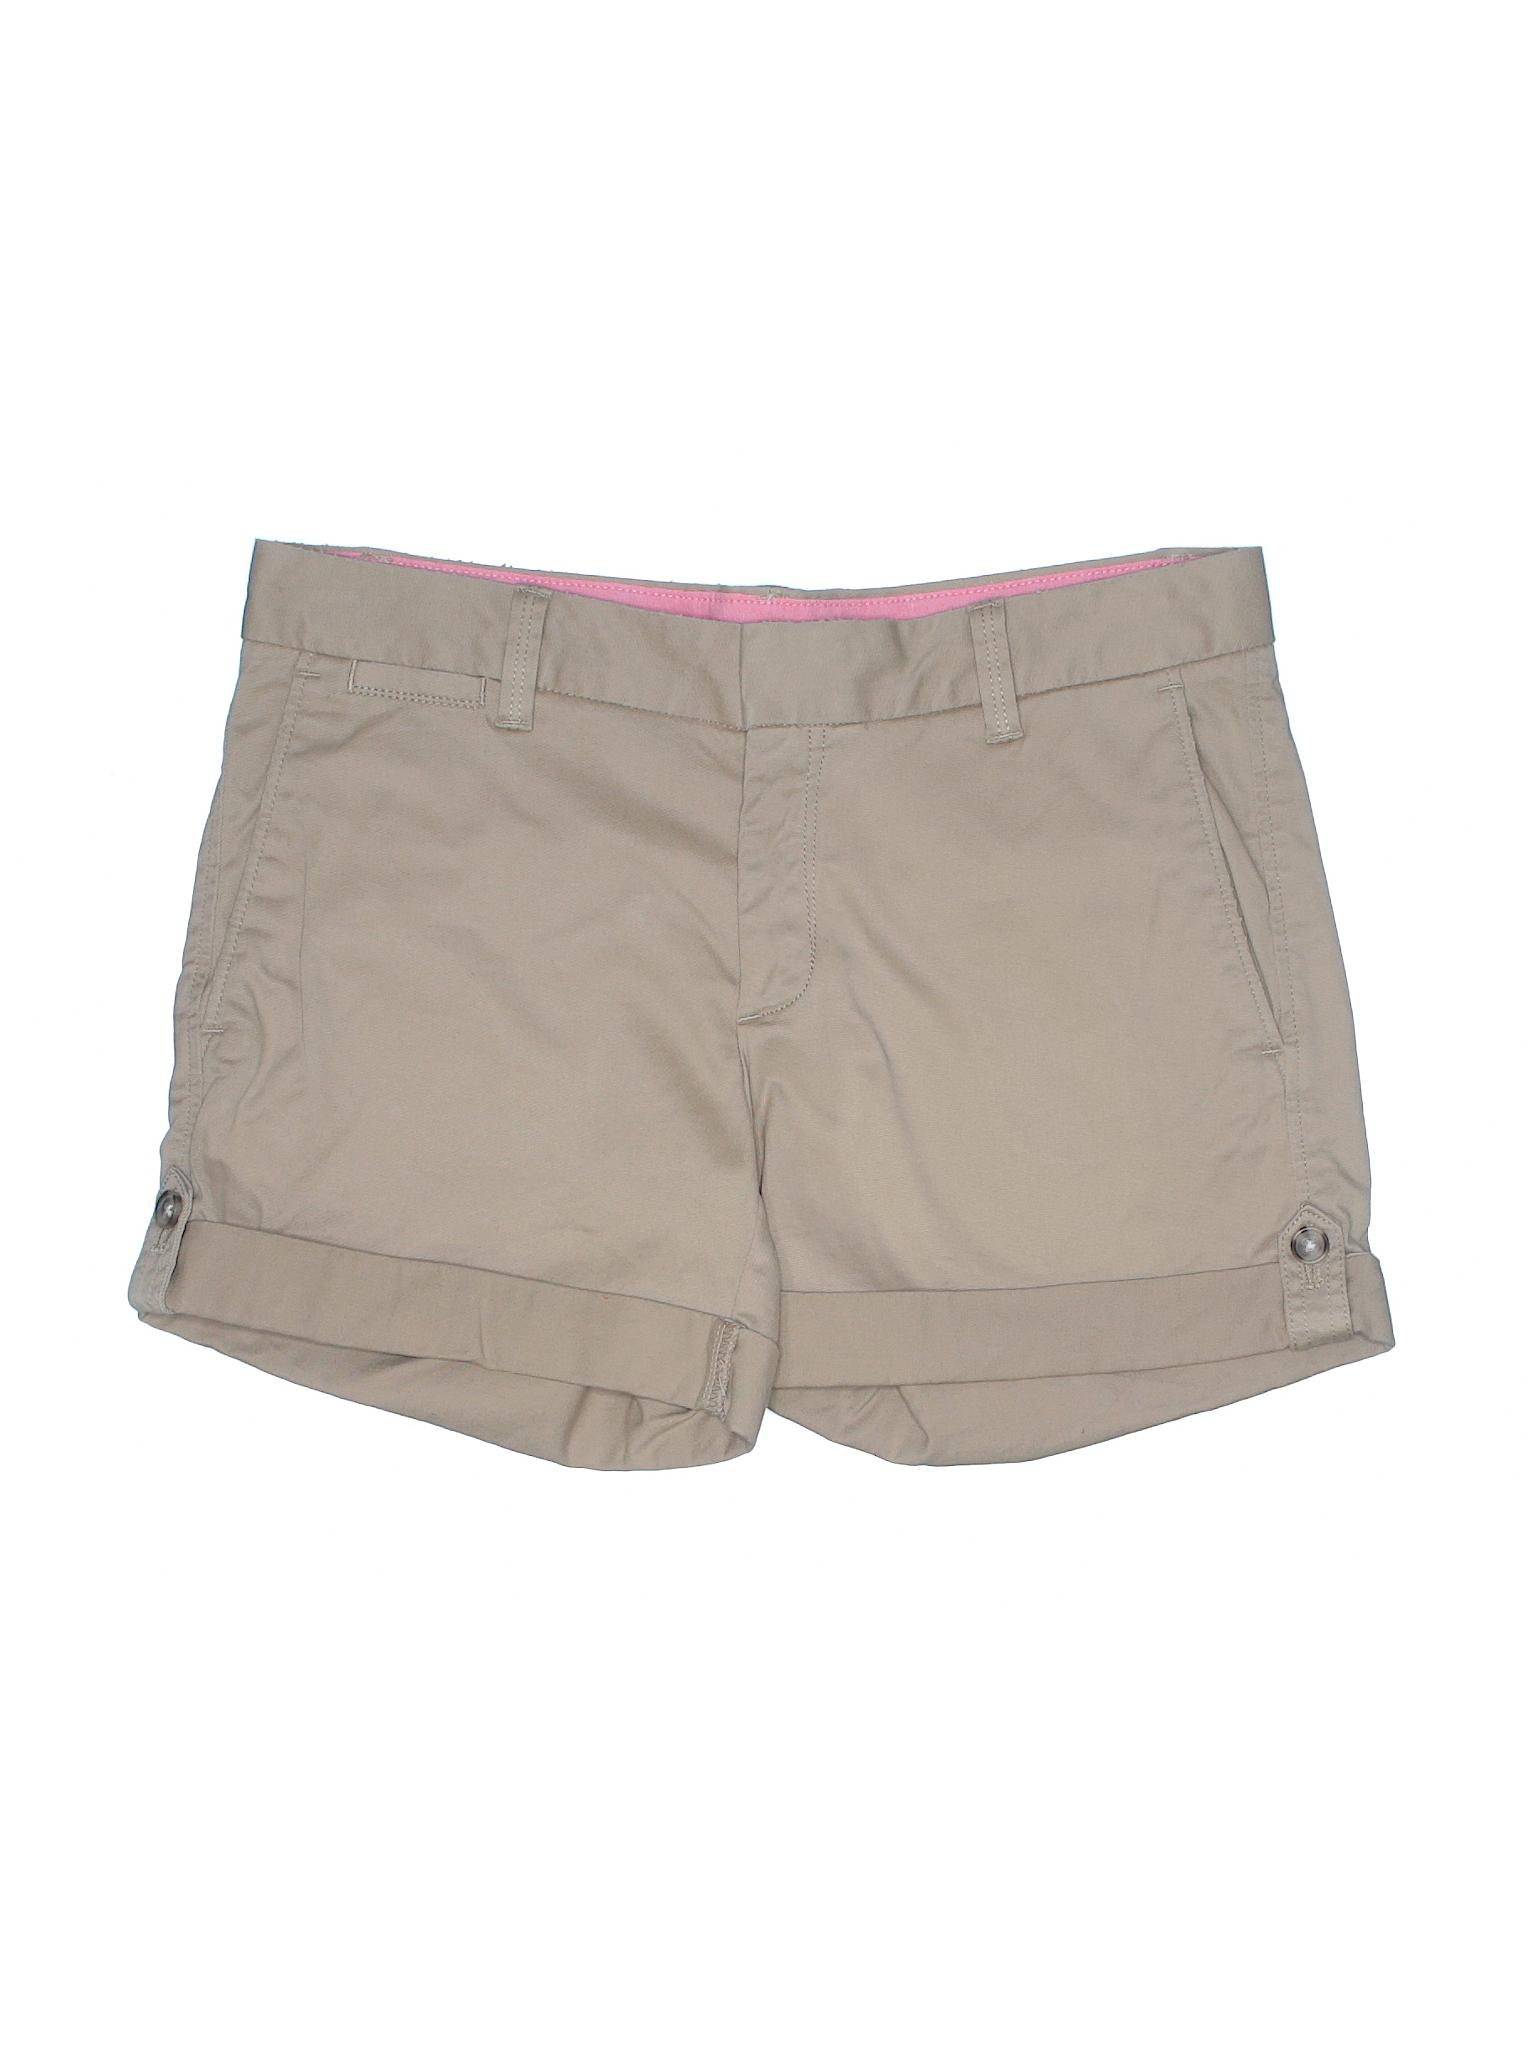 Shorts Boutique leisure Republic Banana Khaki wxzBOp1qYB